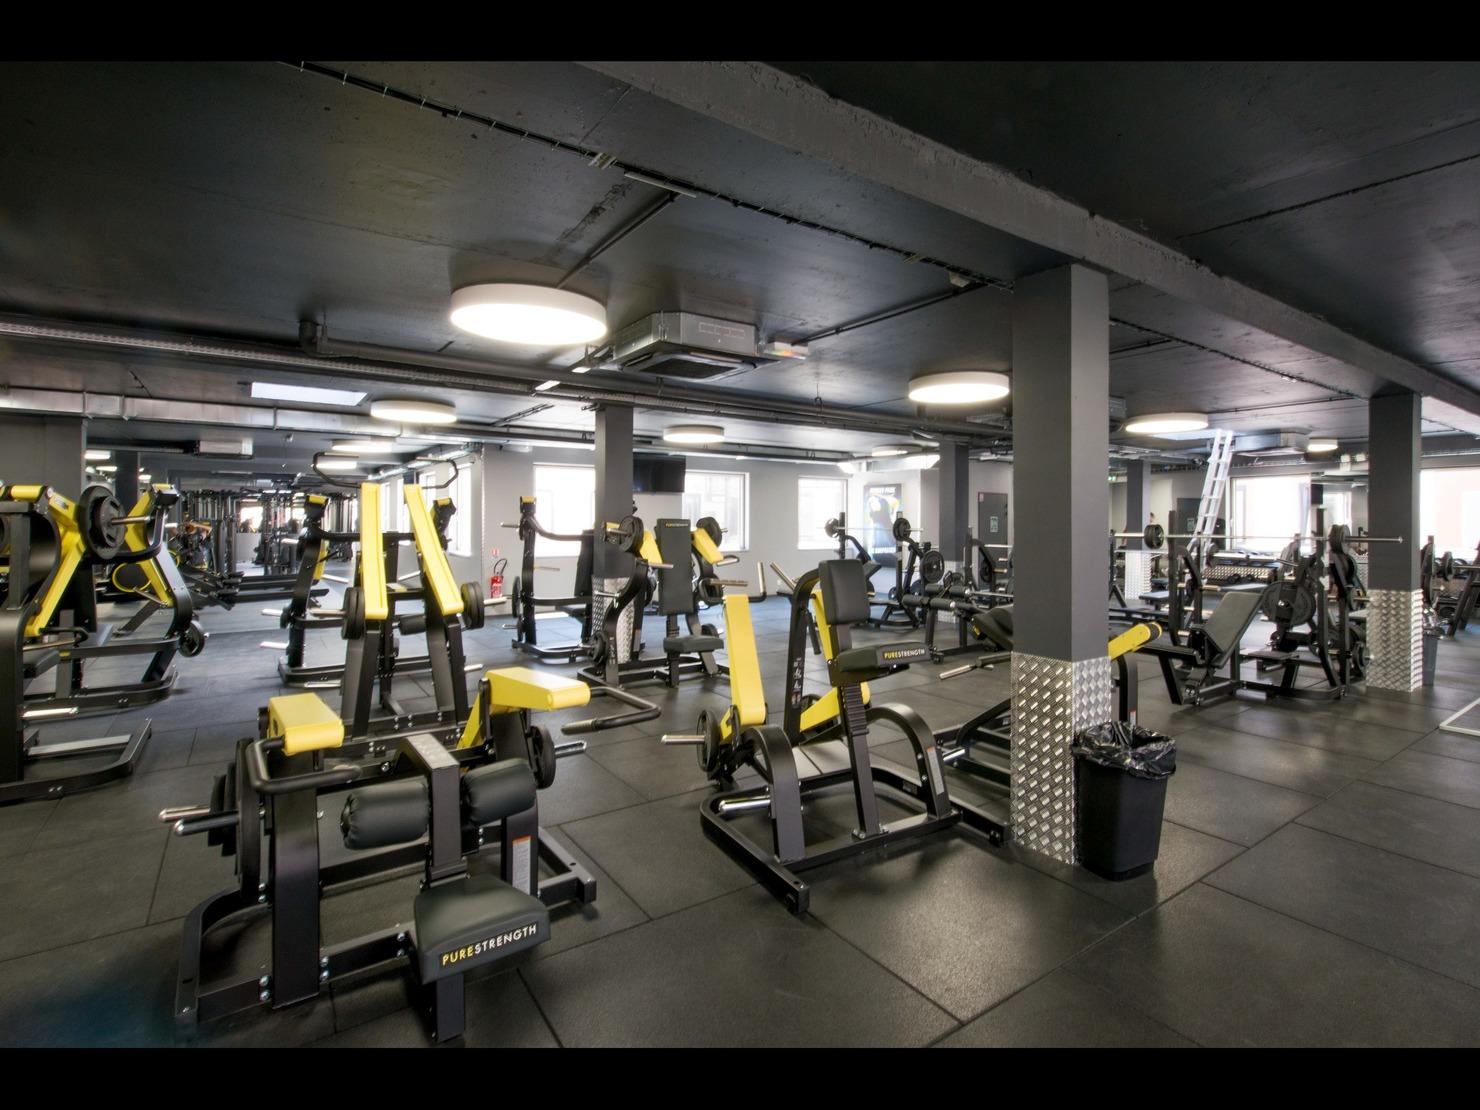 Fitness Park Boulogne-Billancourt-0